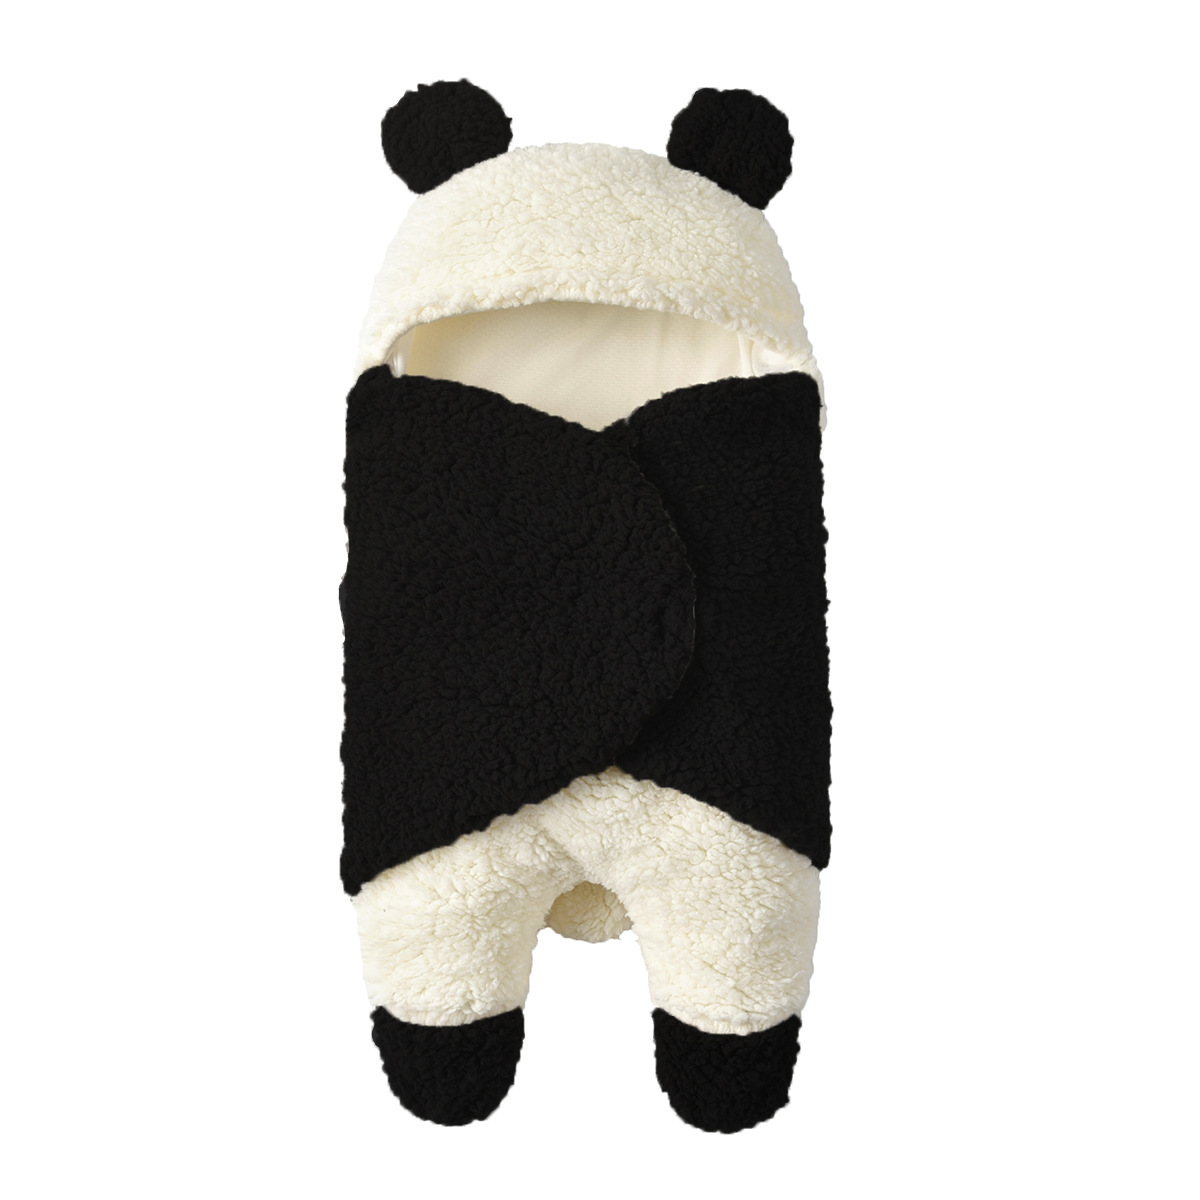 Newborn Baby Sleeping Bag Hooded Plush Swaddle Blanket Towel Wrap Fleece Swaddle Warm Receiving Blanket Sleep Bag Sack Stroller